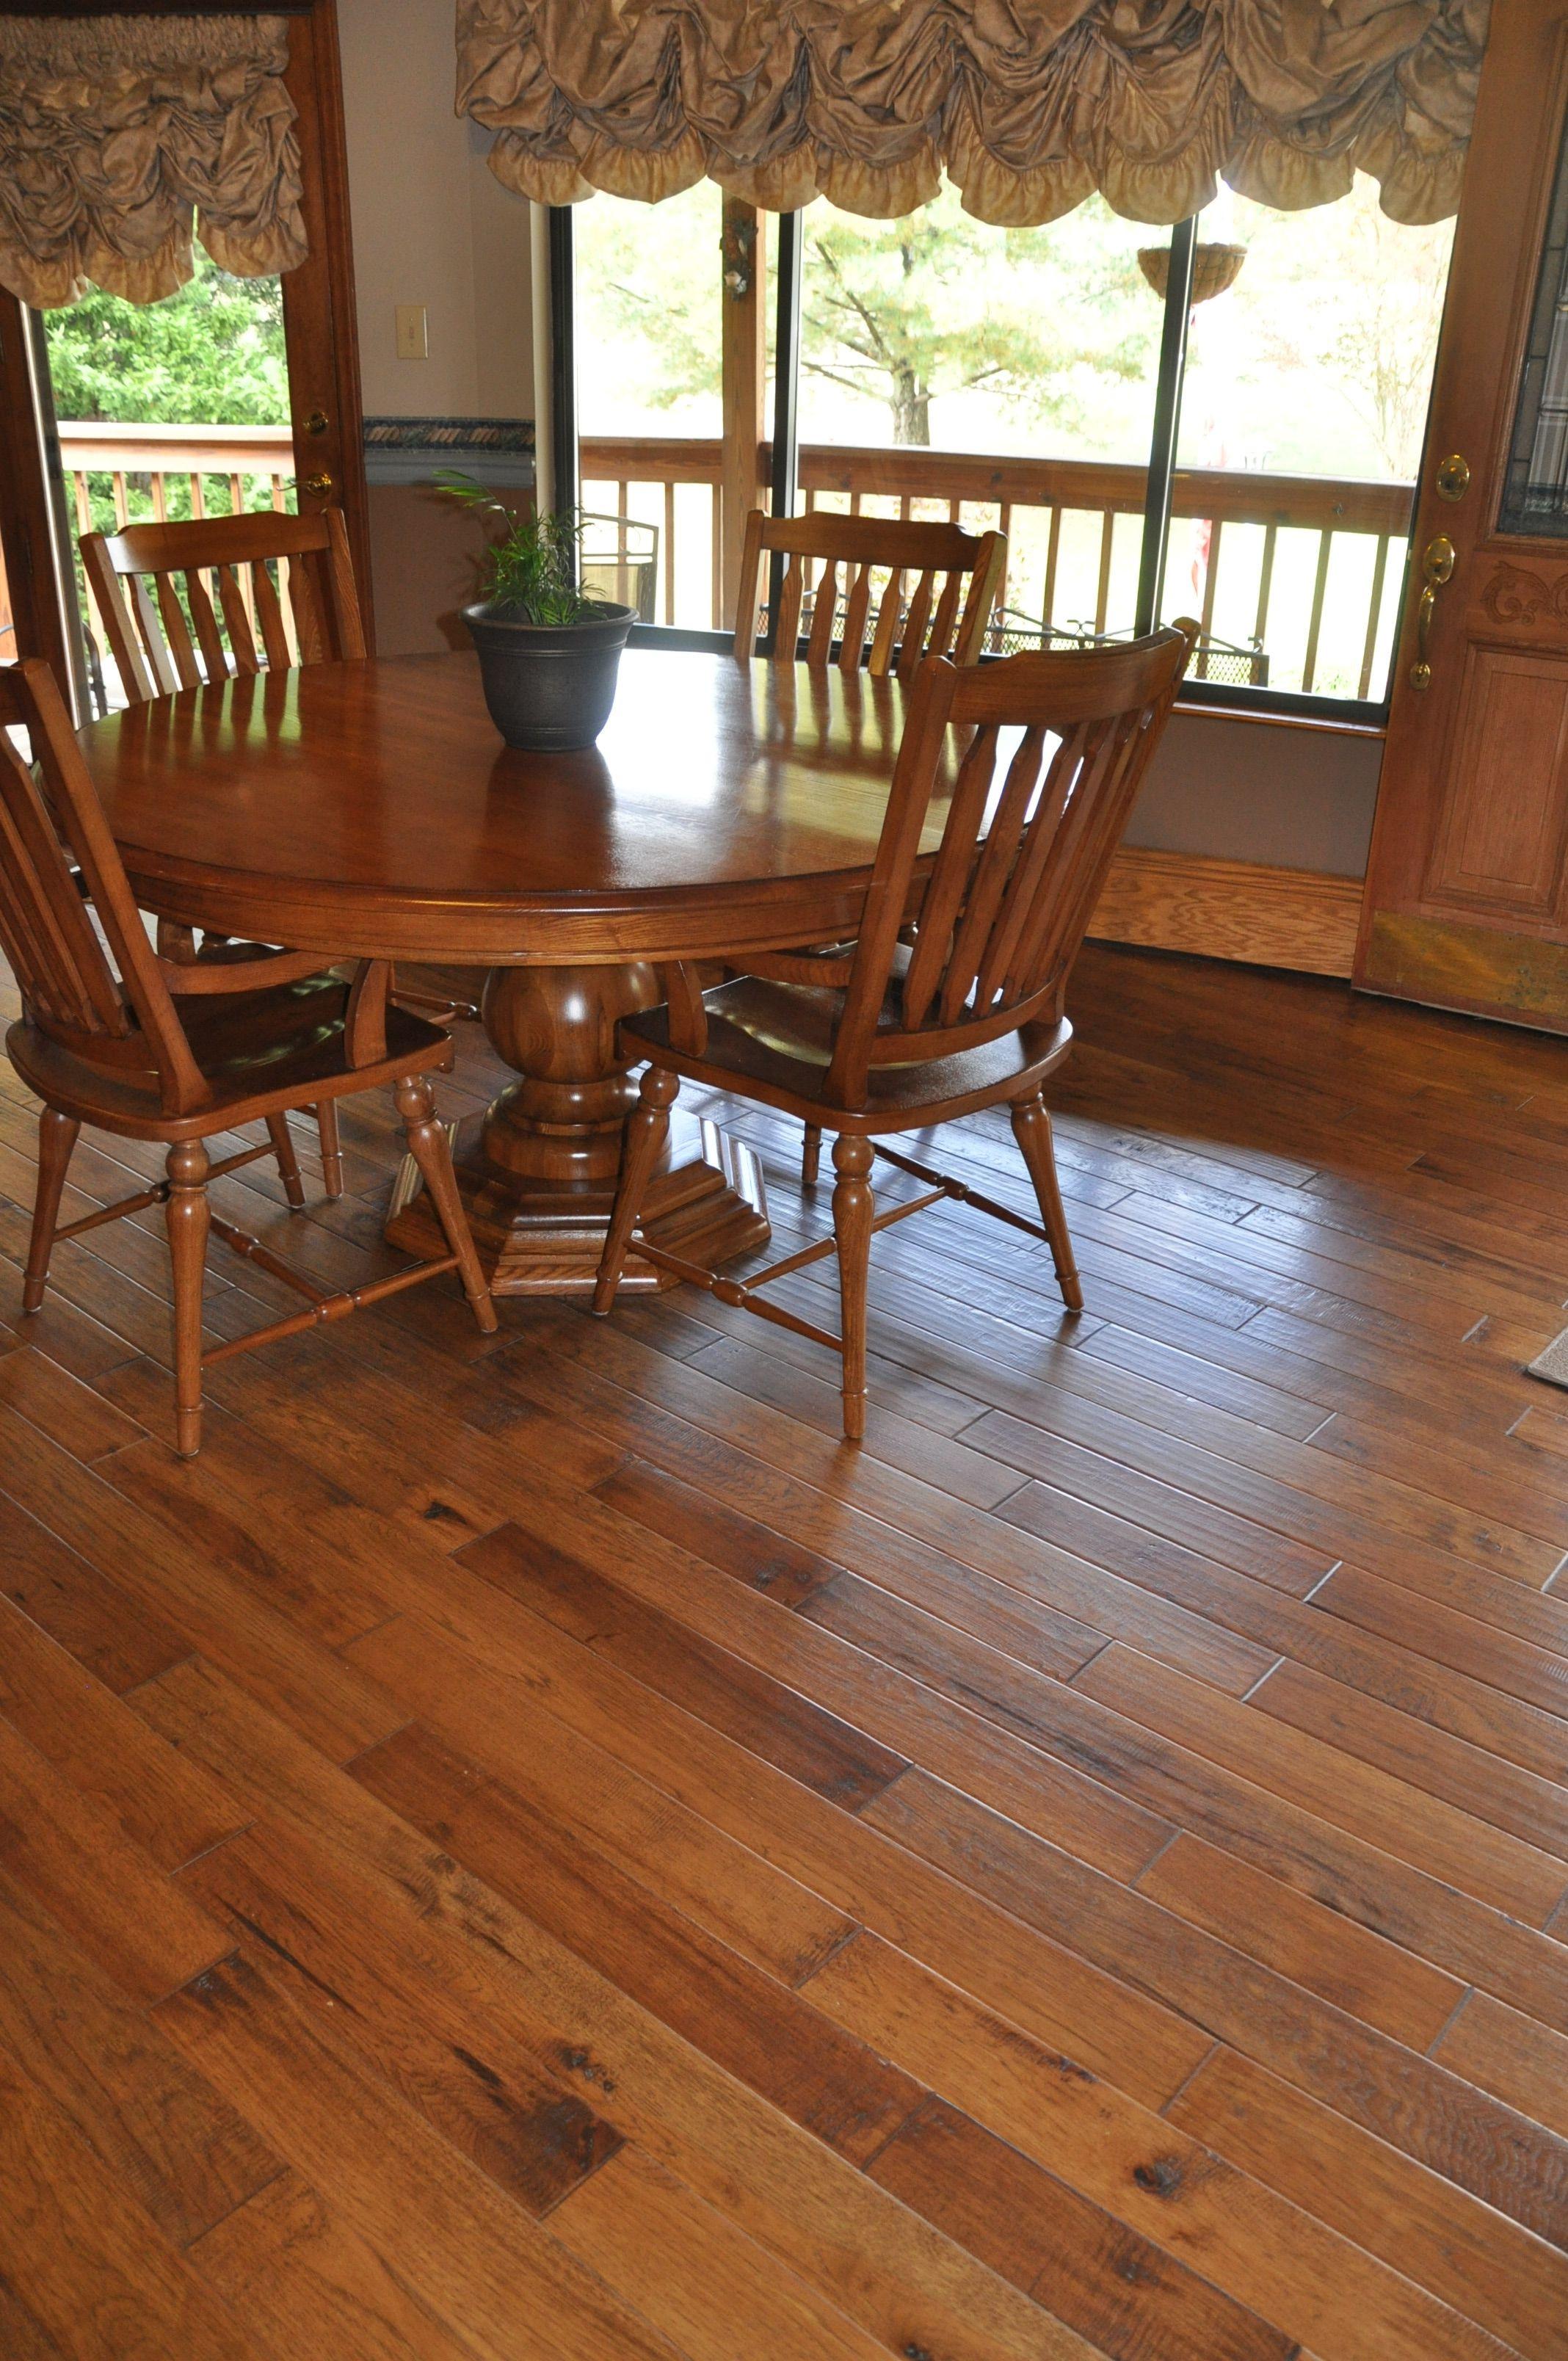 hardwood floor refinishing flemington nj of 4 knob creek hickory saddle hardwood flooring your home our within 4 knob creek hickory saddle hardwood flooring